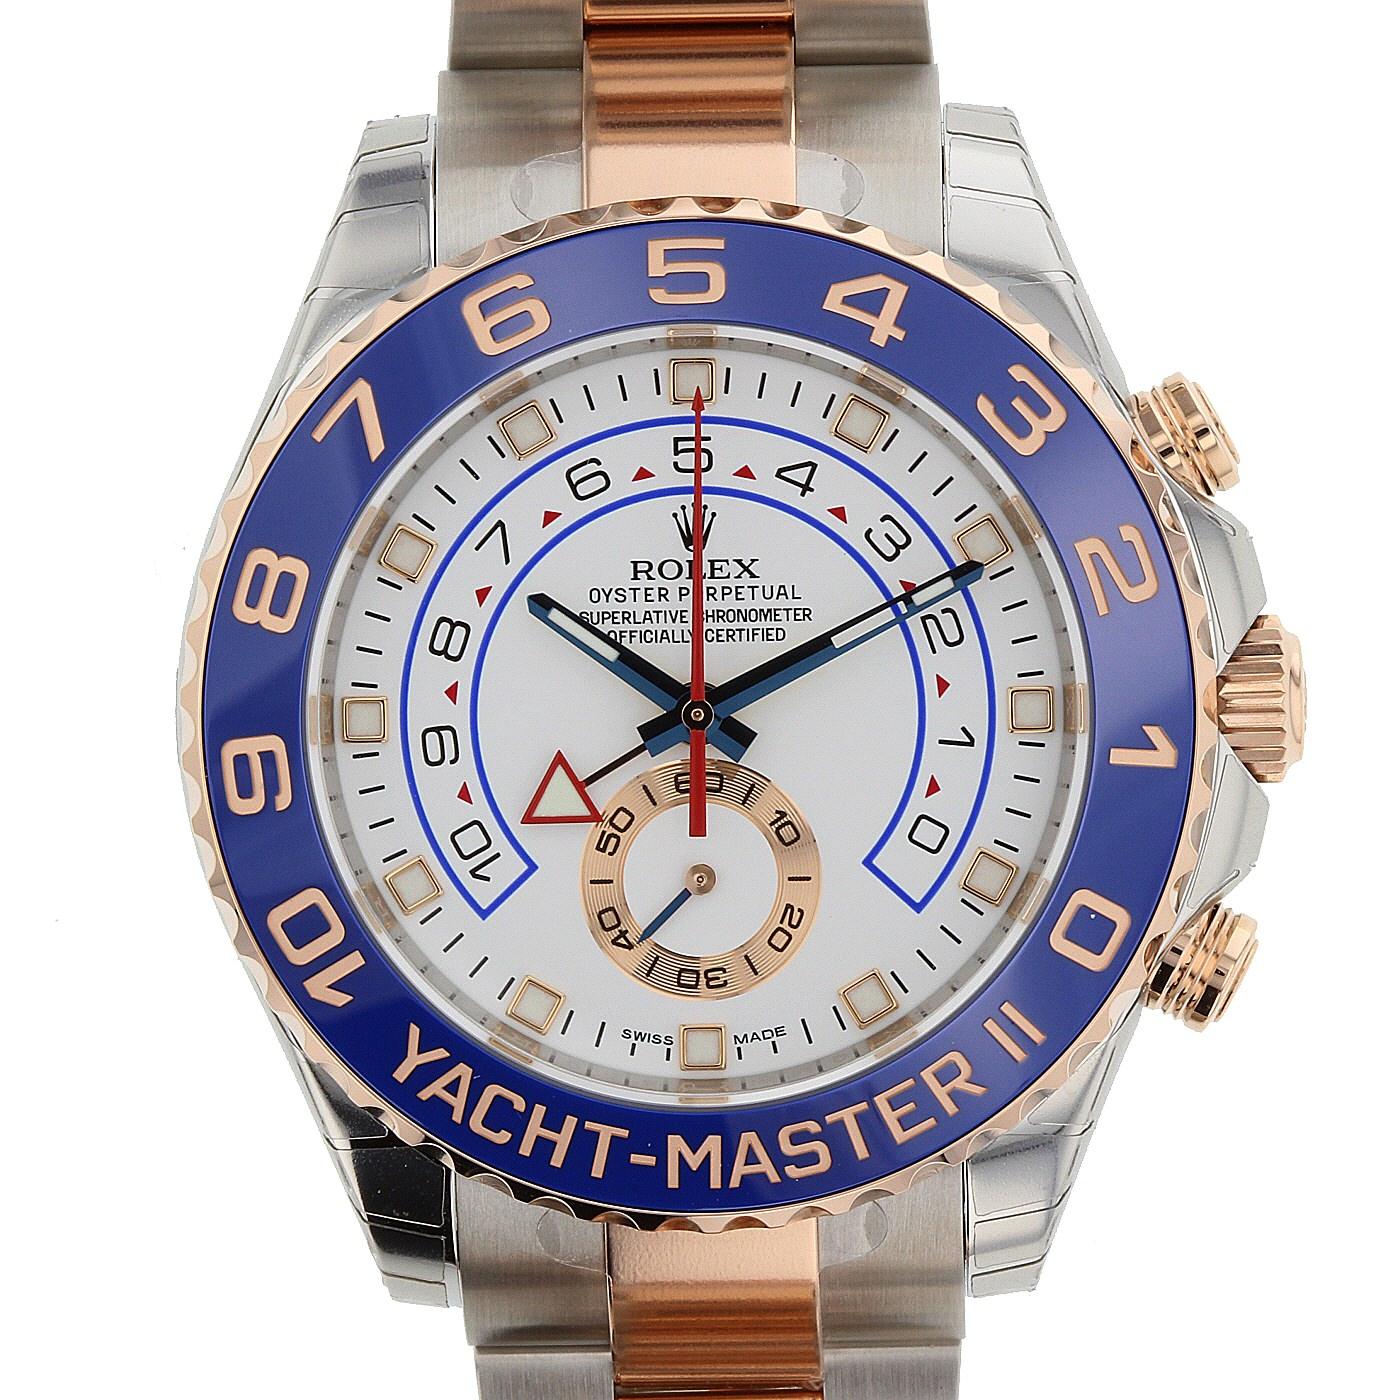 Rolex 0 Finance >> Rolex Yachtmaster 11 116681 - Edinburgh Watch Company | Luxury Timepieces